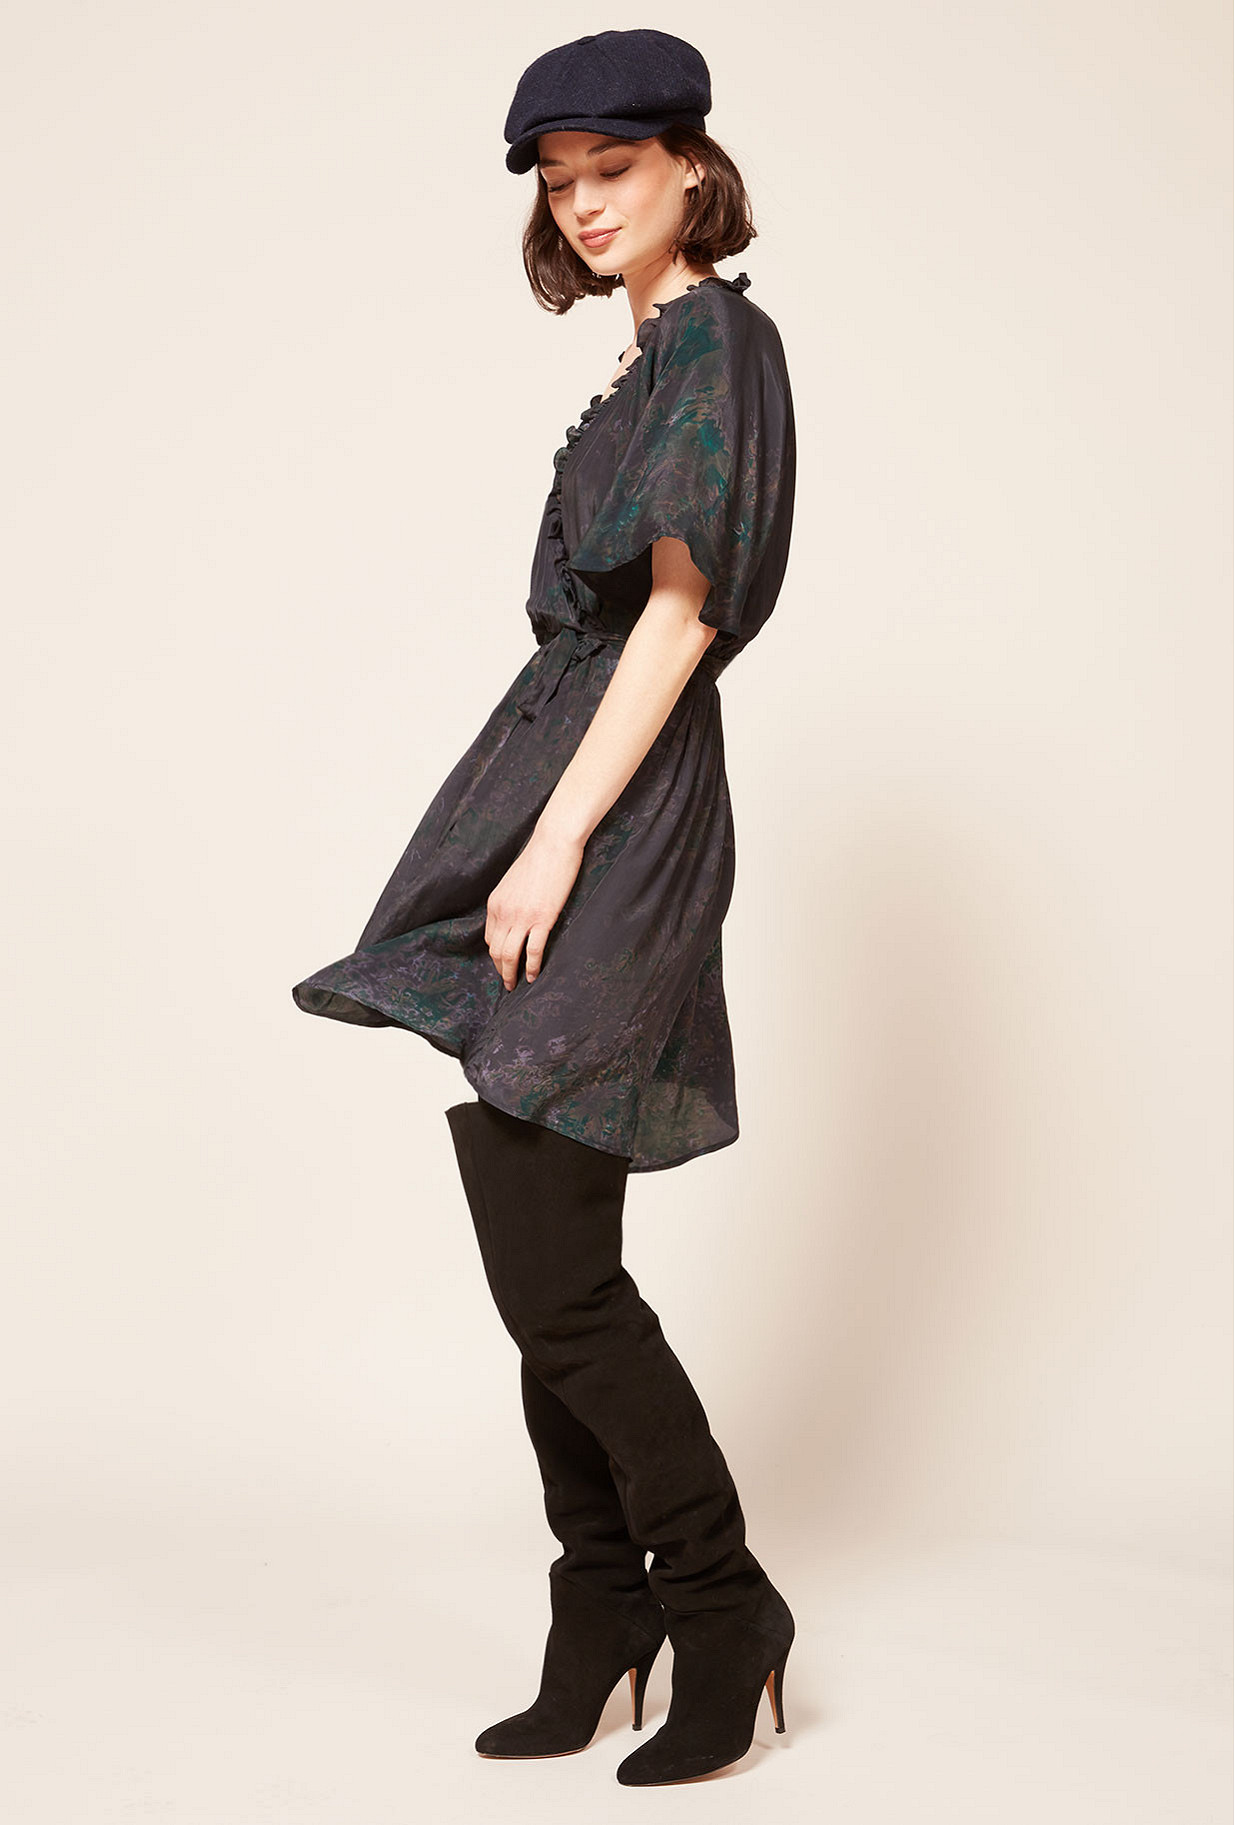 Dream  Dress  Morganite Mes demoiselles fashion clothes designer Paris